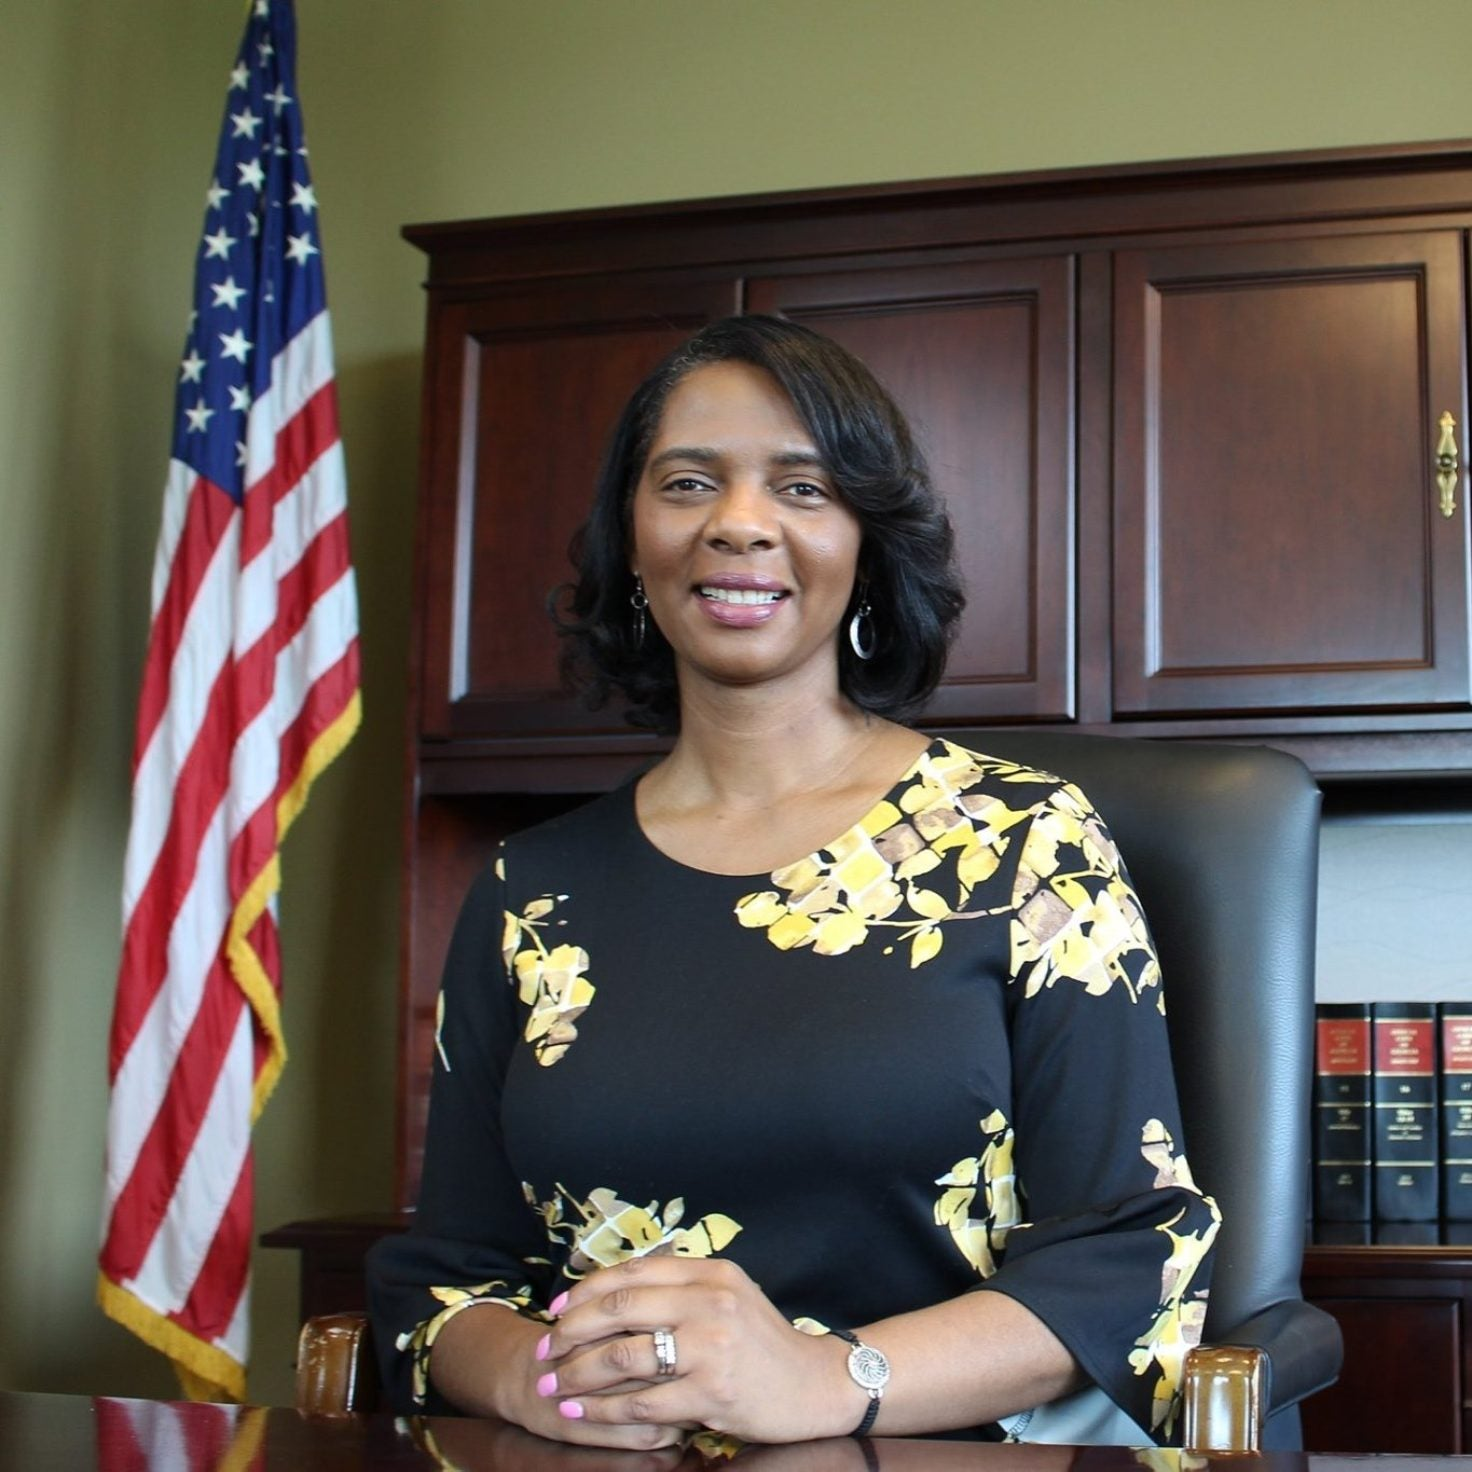 Cobb County, Georgia, Swears In First Black, Female District Attorney